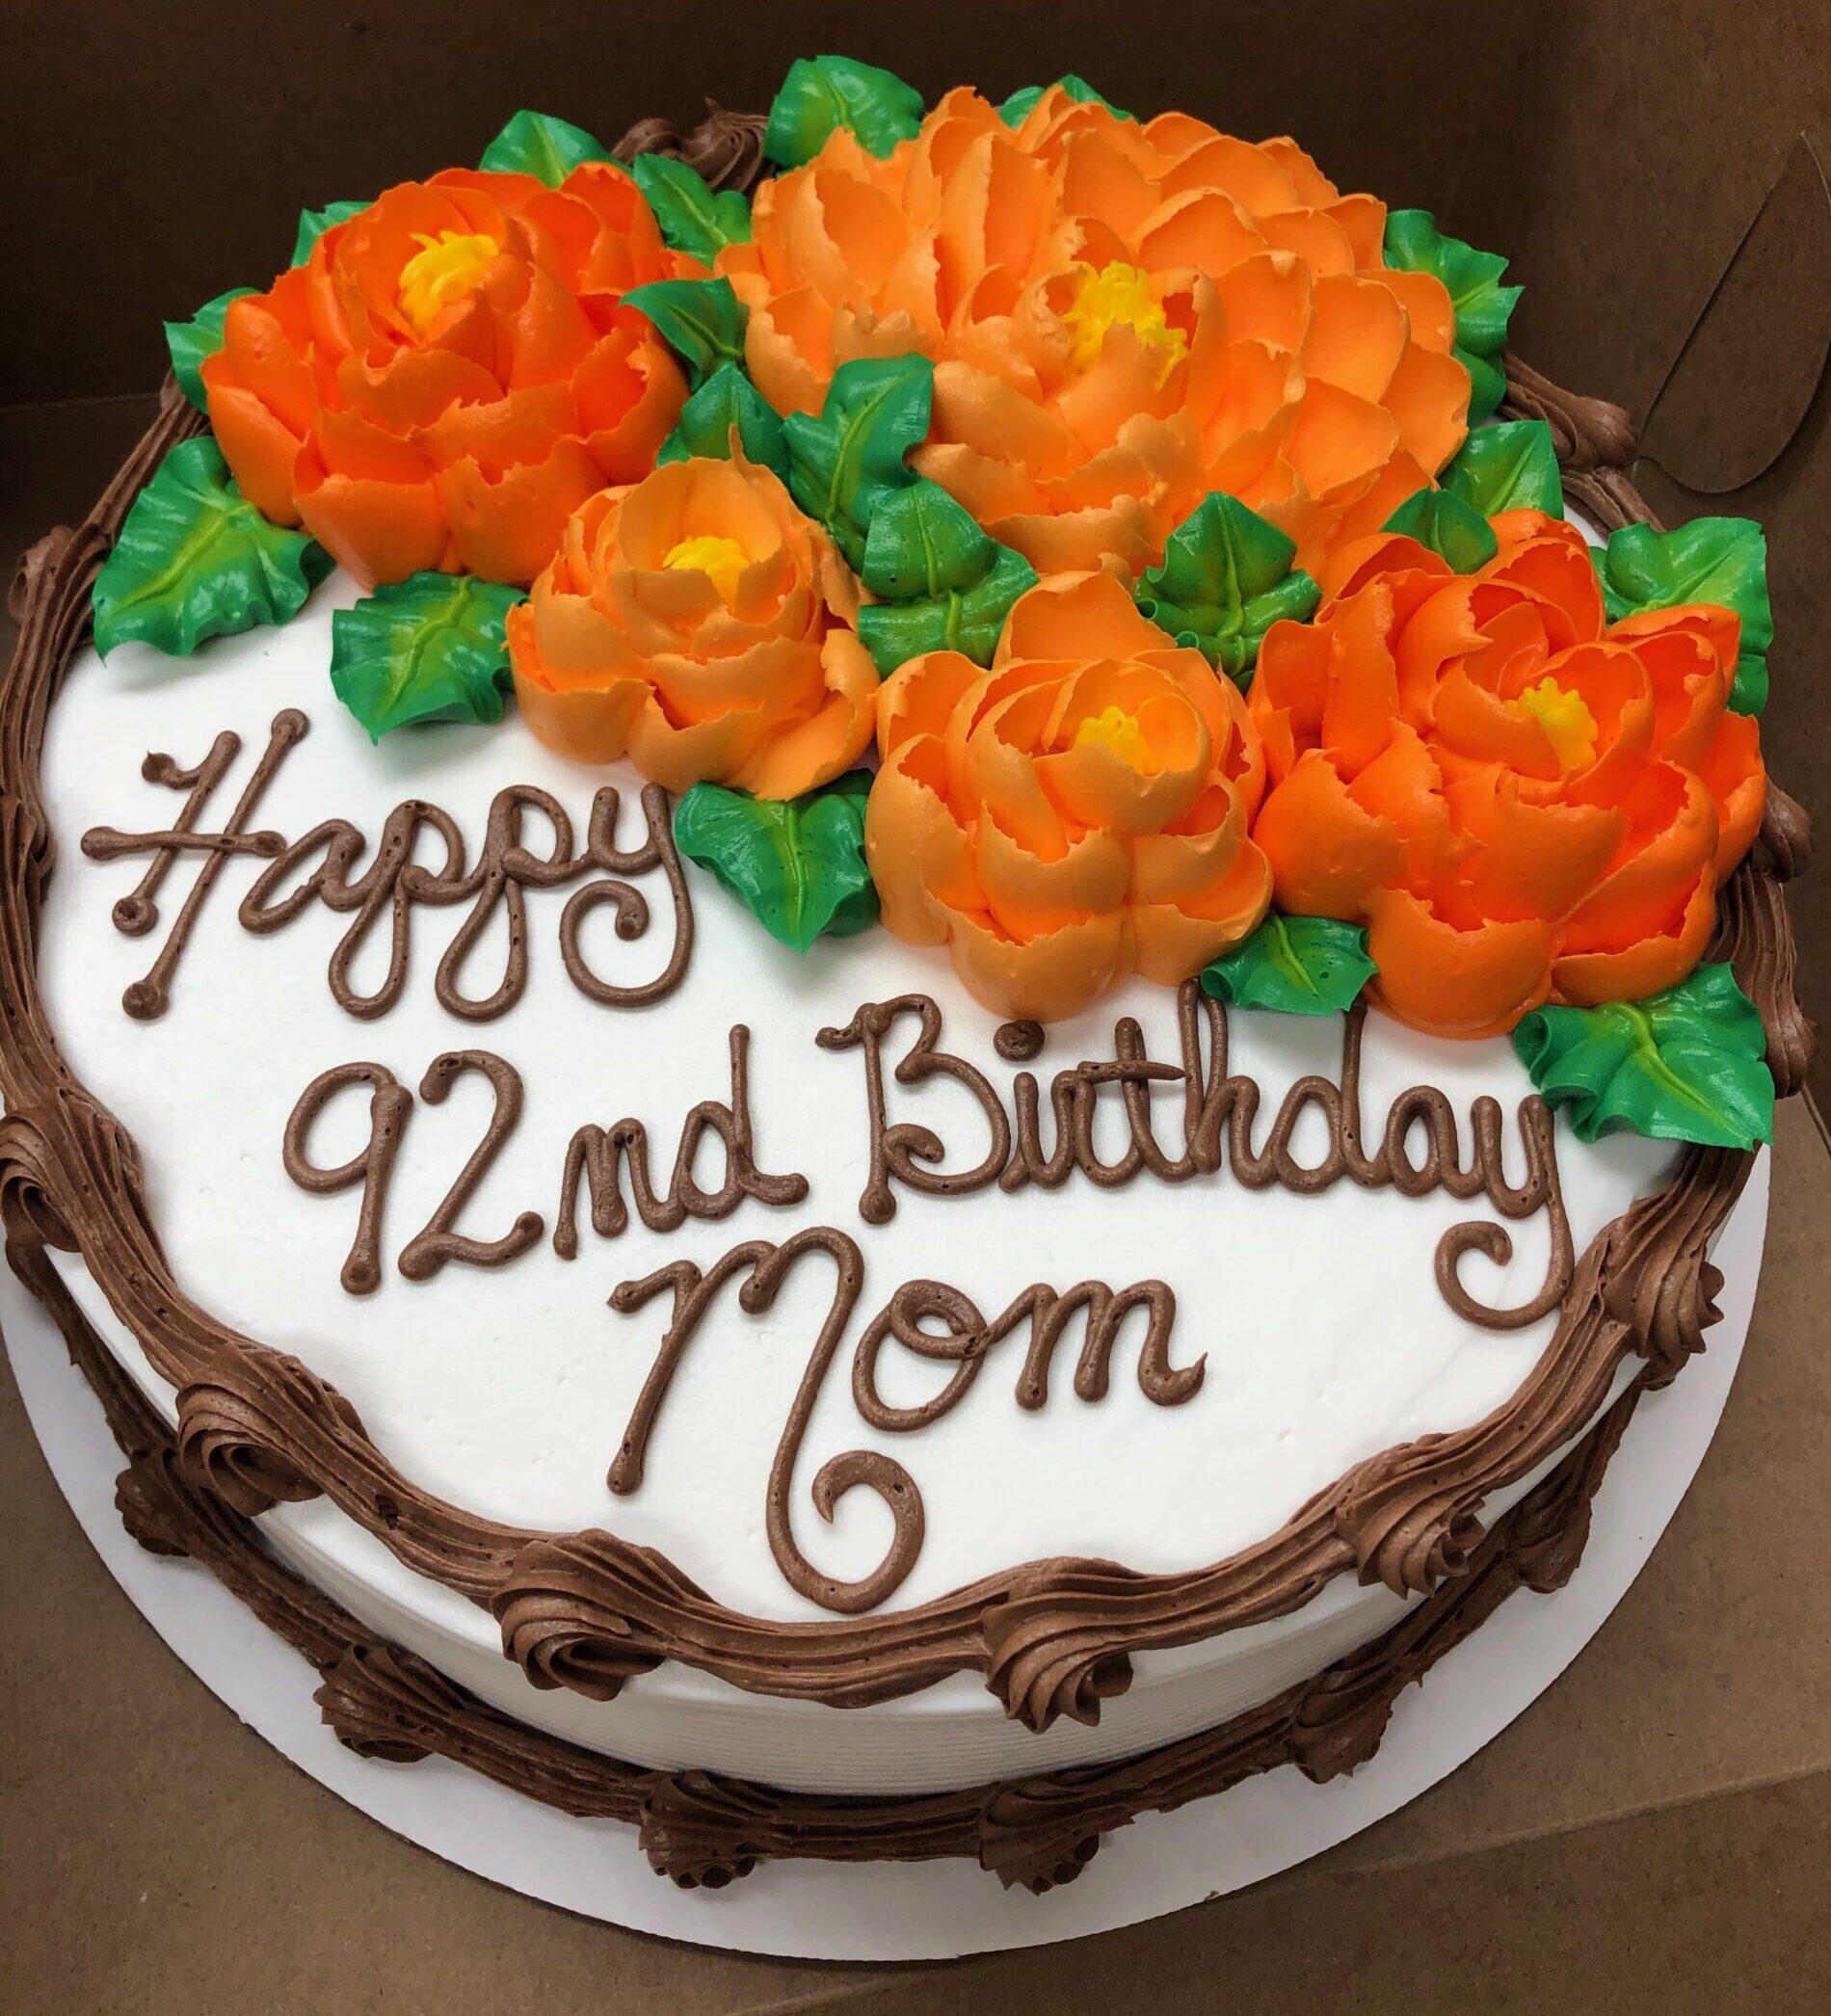 Happy 92nd Birthday Cake with Orange flowers